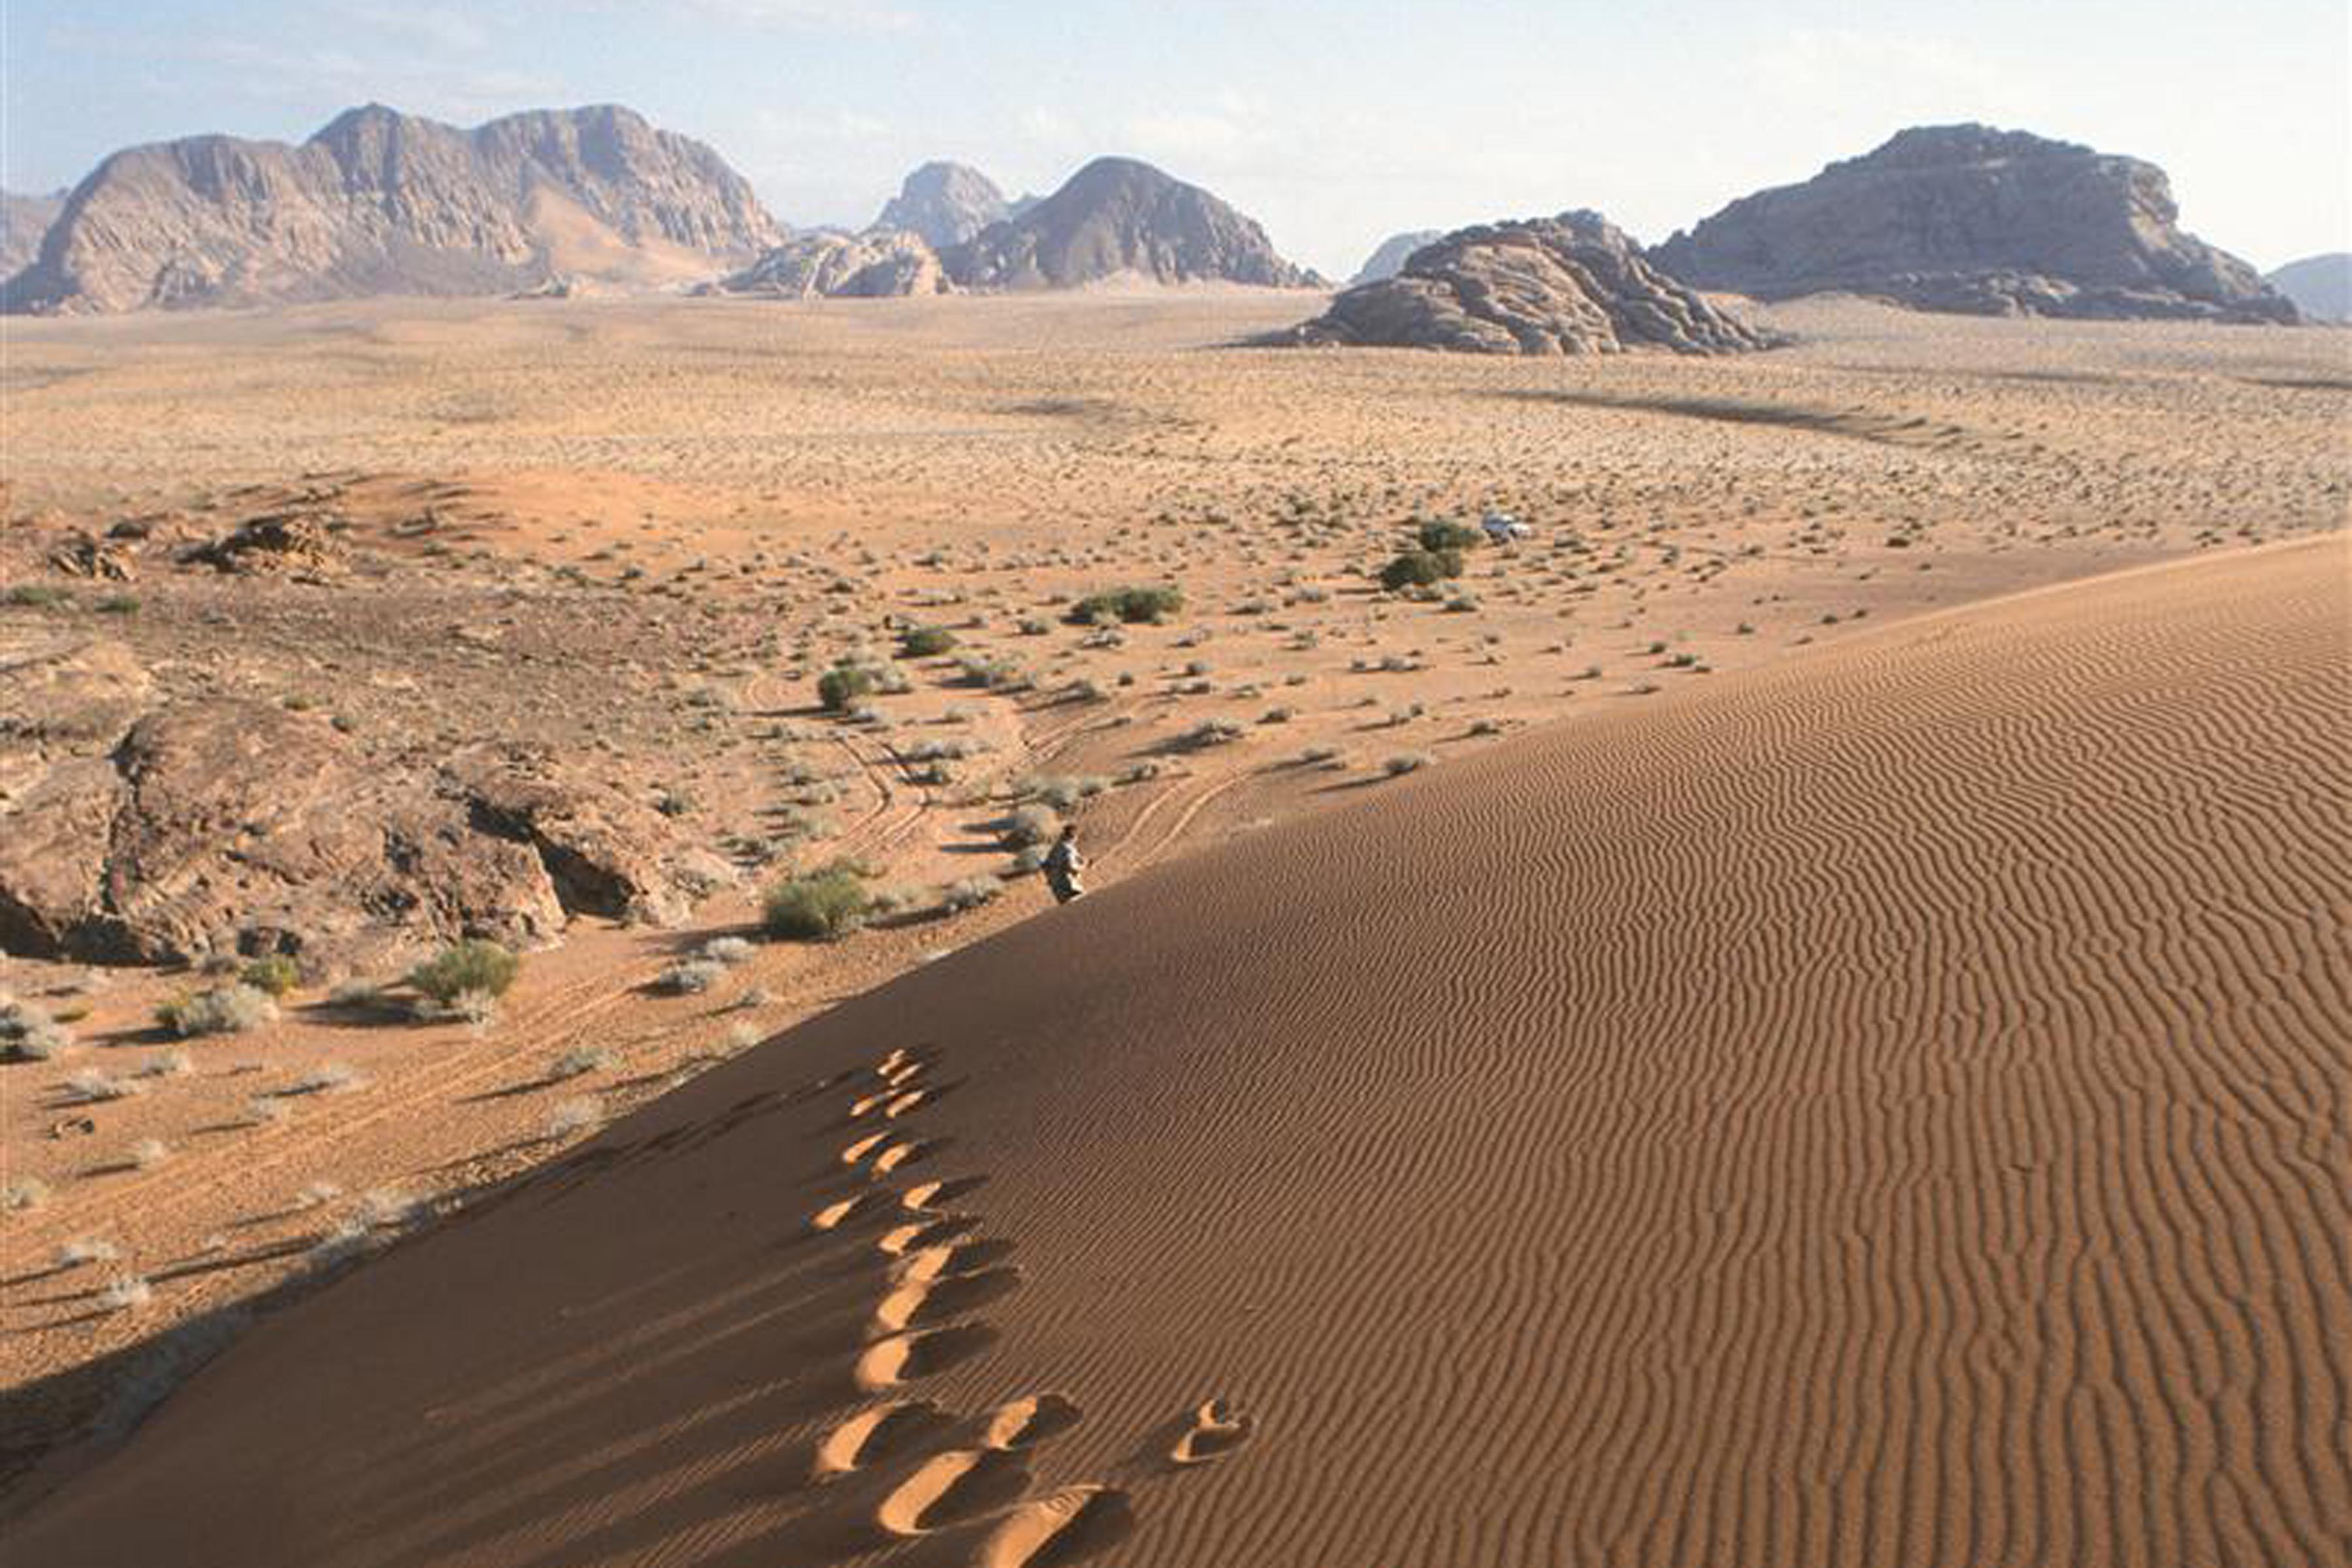 Hike the length of the Jordan Trail